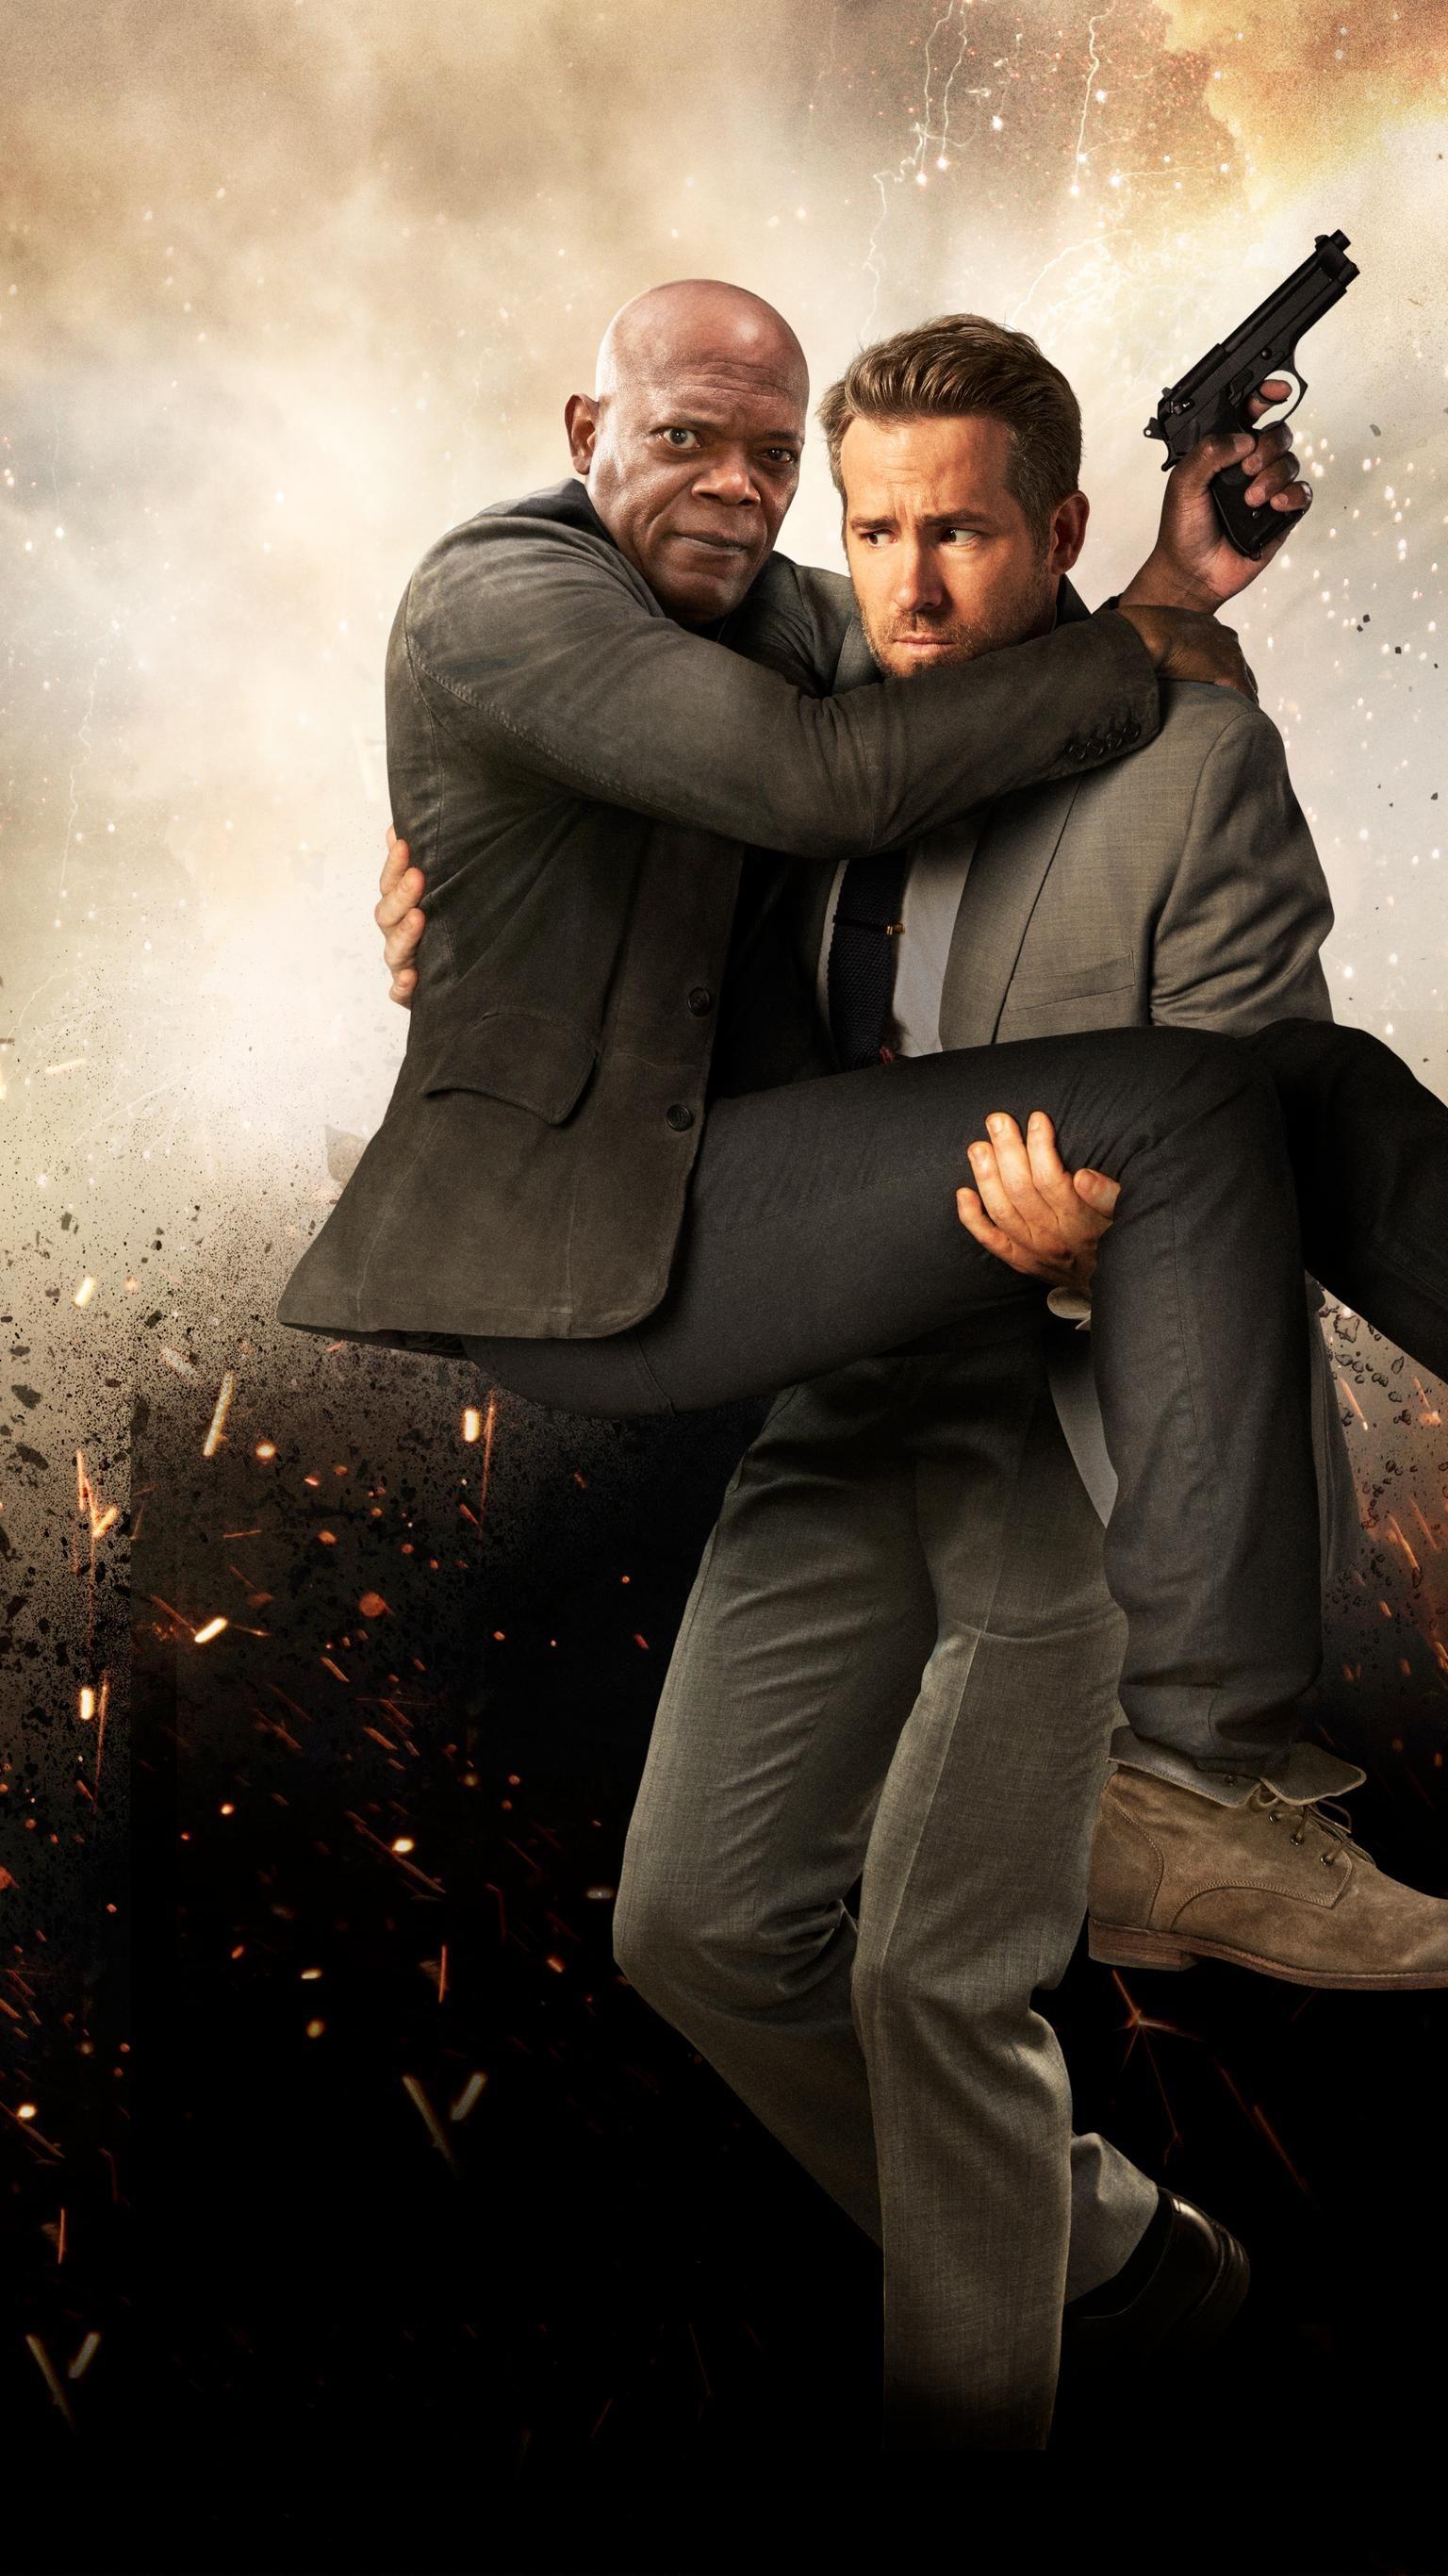 The Hitman S Bodyguard Wallpaper Mobile Lta Movie Desktop Hd